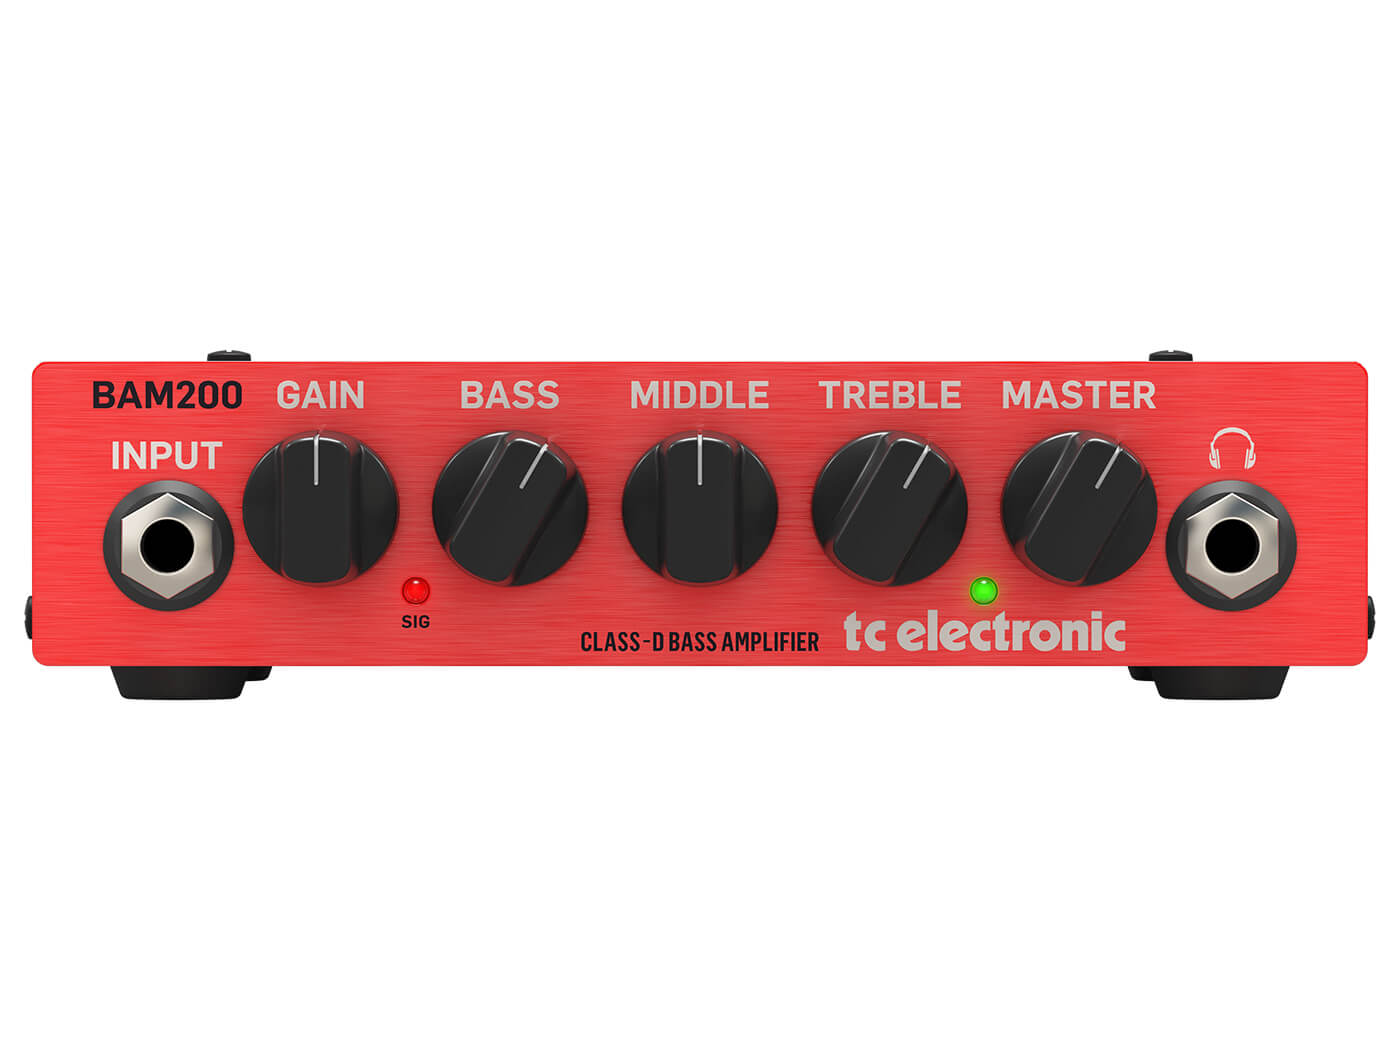 TC Electronic BAM200 bass amp